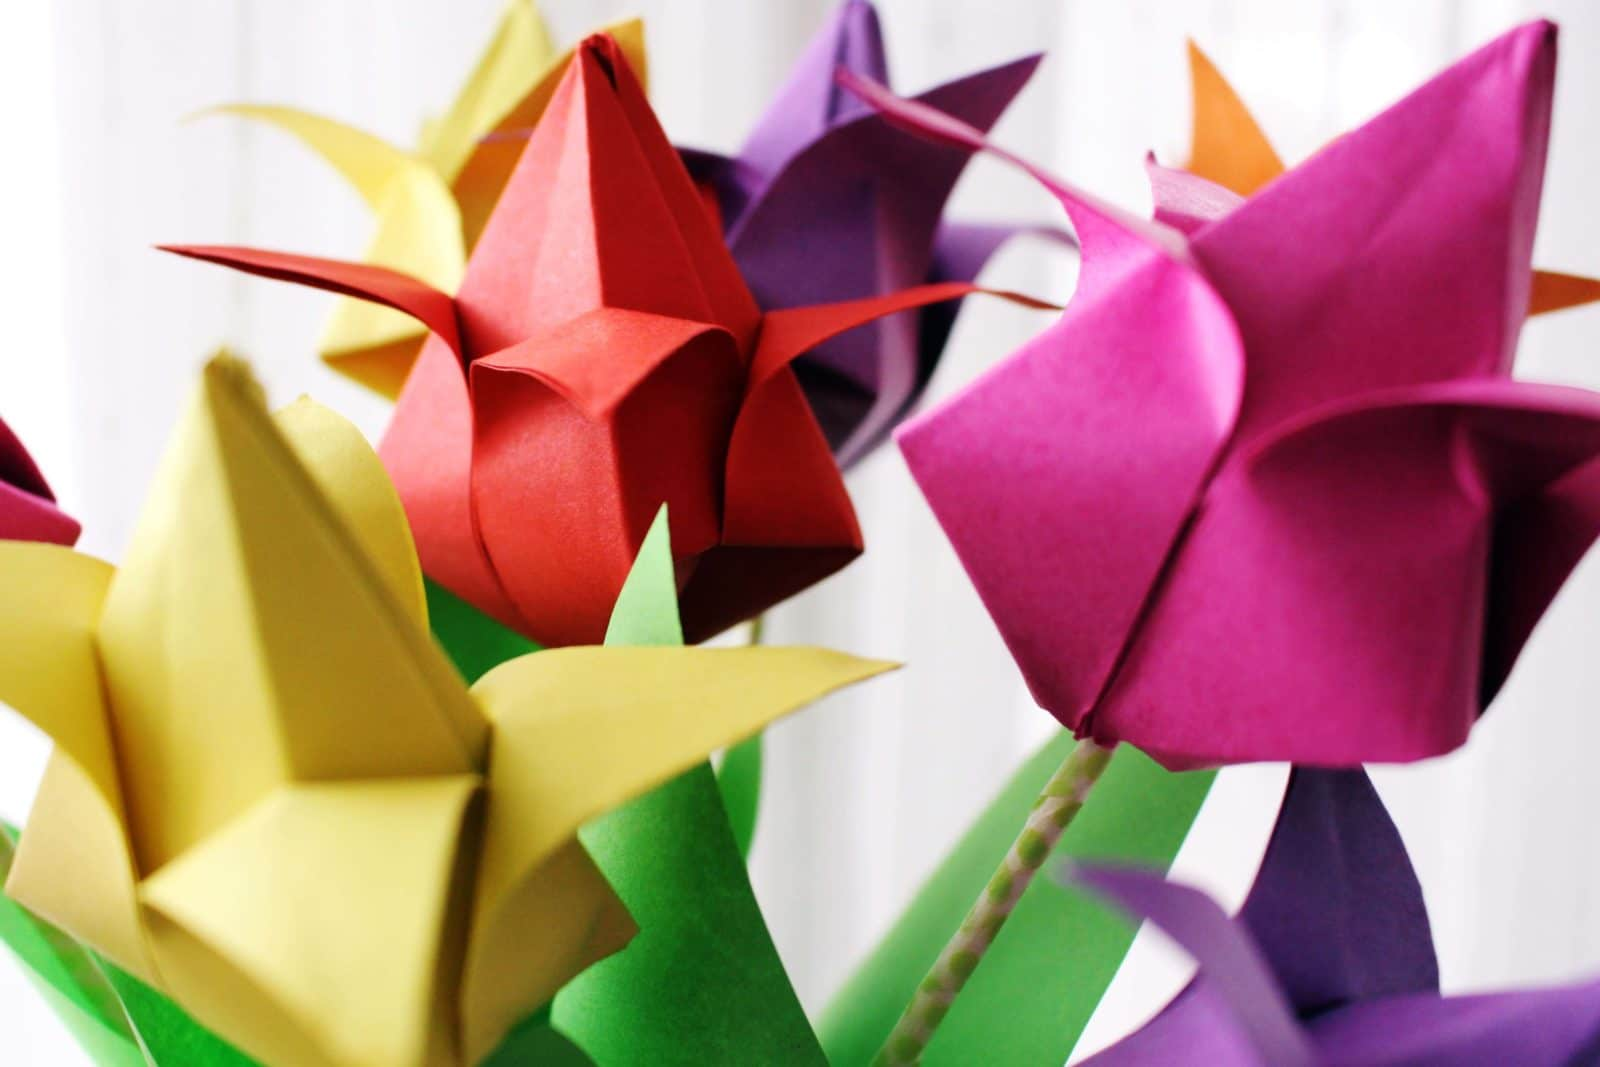 kunterbunte origami tulpen kreativ durch den monat challenge handmade kultur. Black Bedroom Furniture Sets. Home Design Ideas